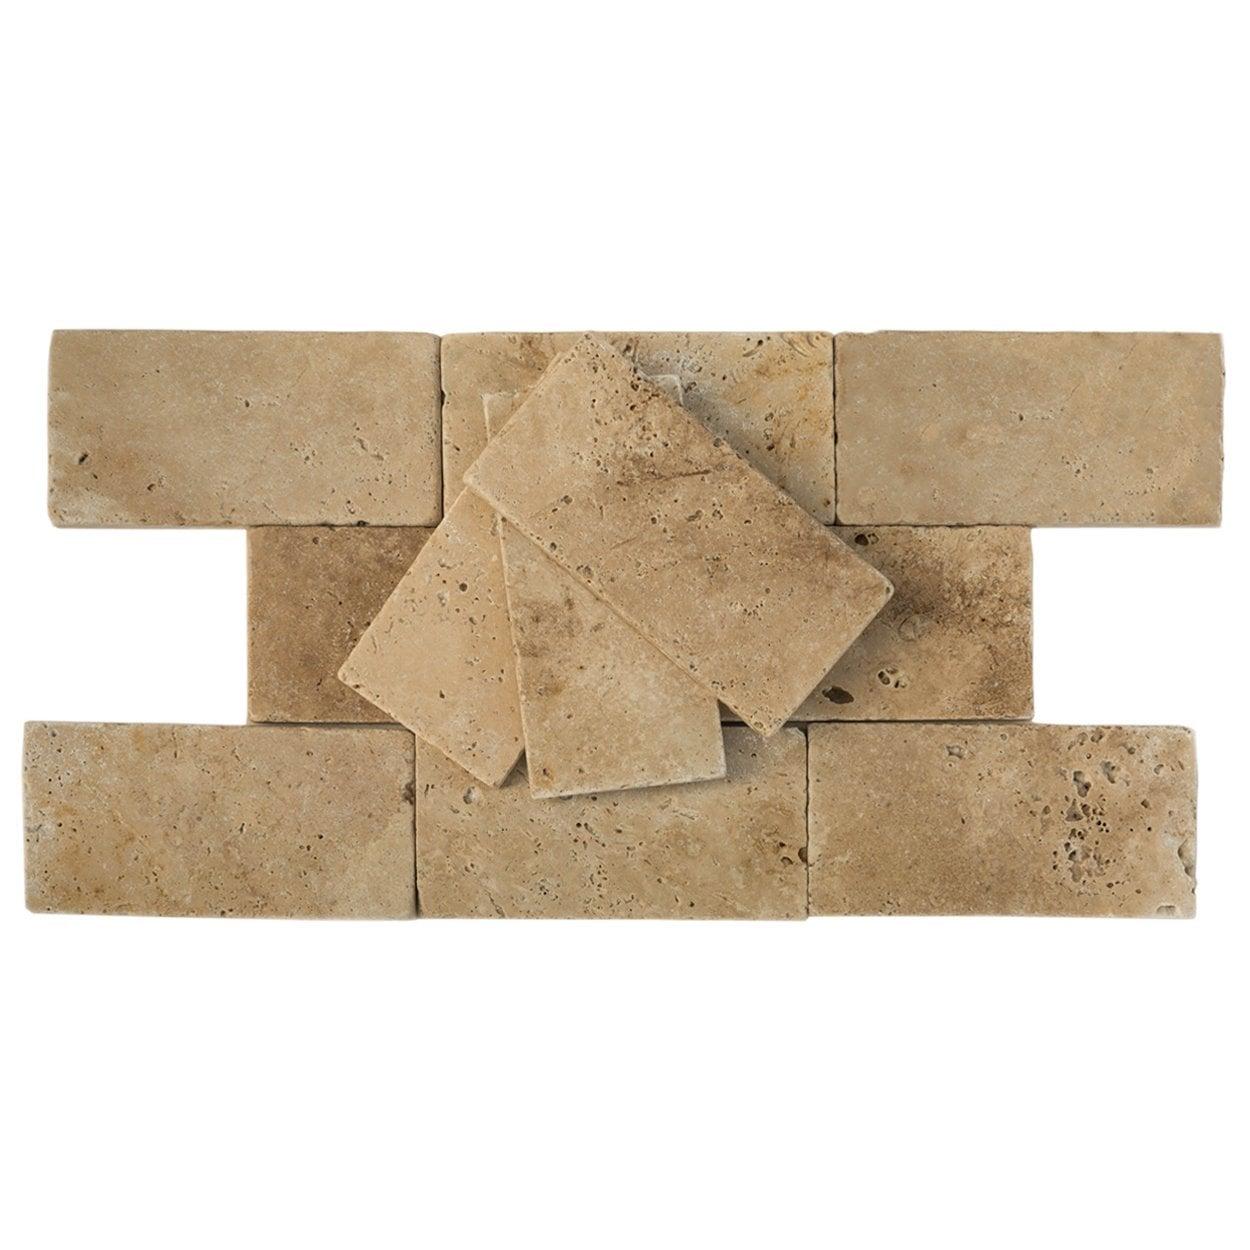 "Light Beige / 3""x6""x3/8"" / Tumbled Antique Tumbled Travertine Backsplash Tiles 0"